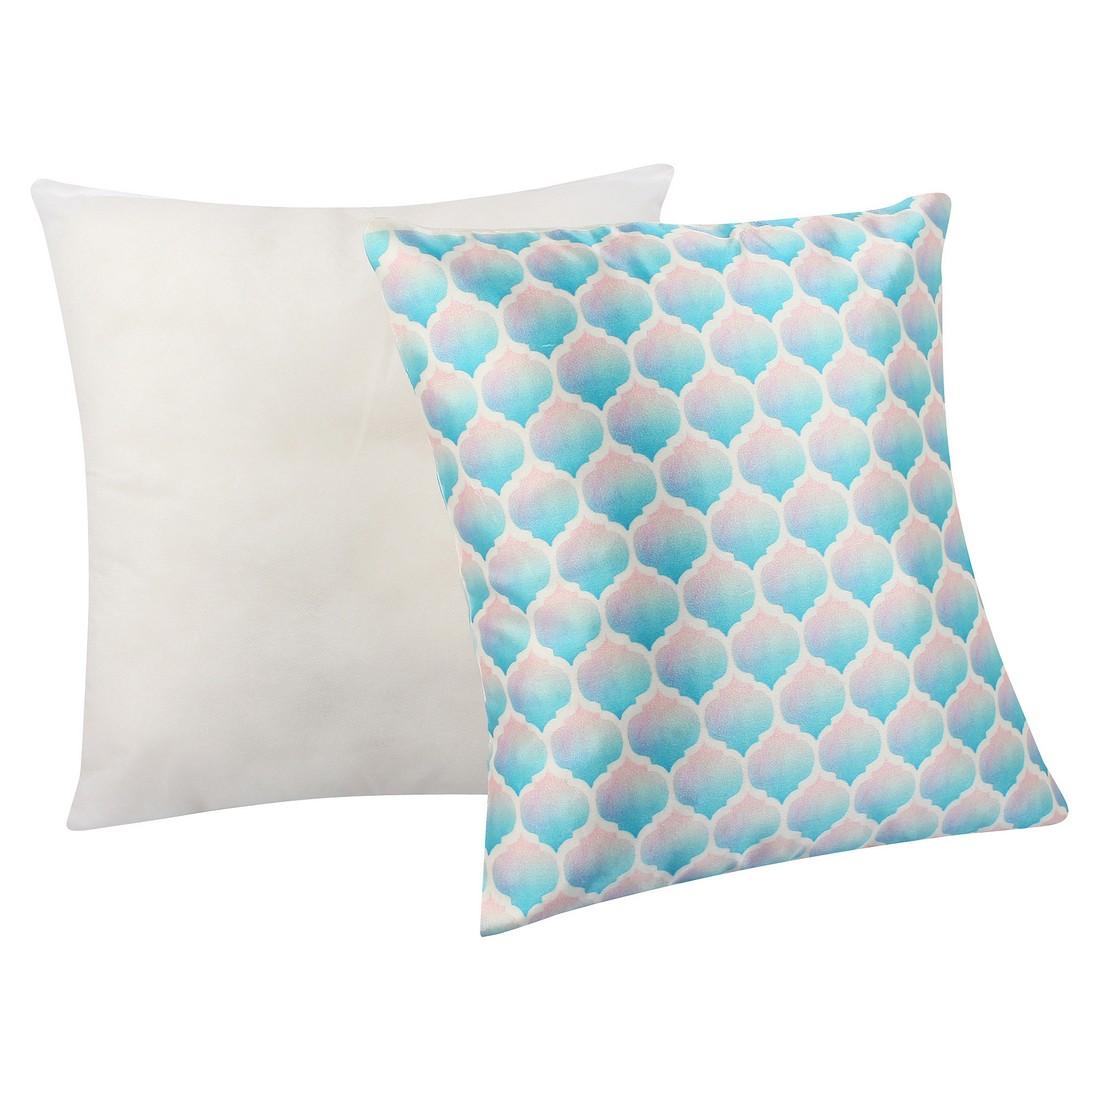 "Sattva Premium Digital Printed Cushion Cover CU021 With Filler Multicolor - Size 16""x16"""